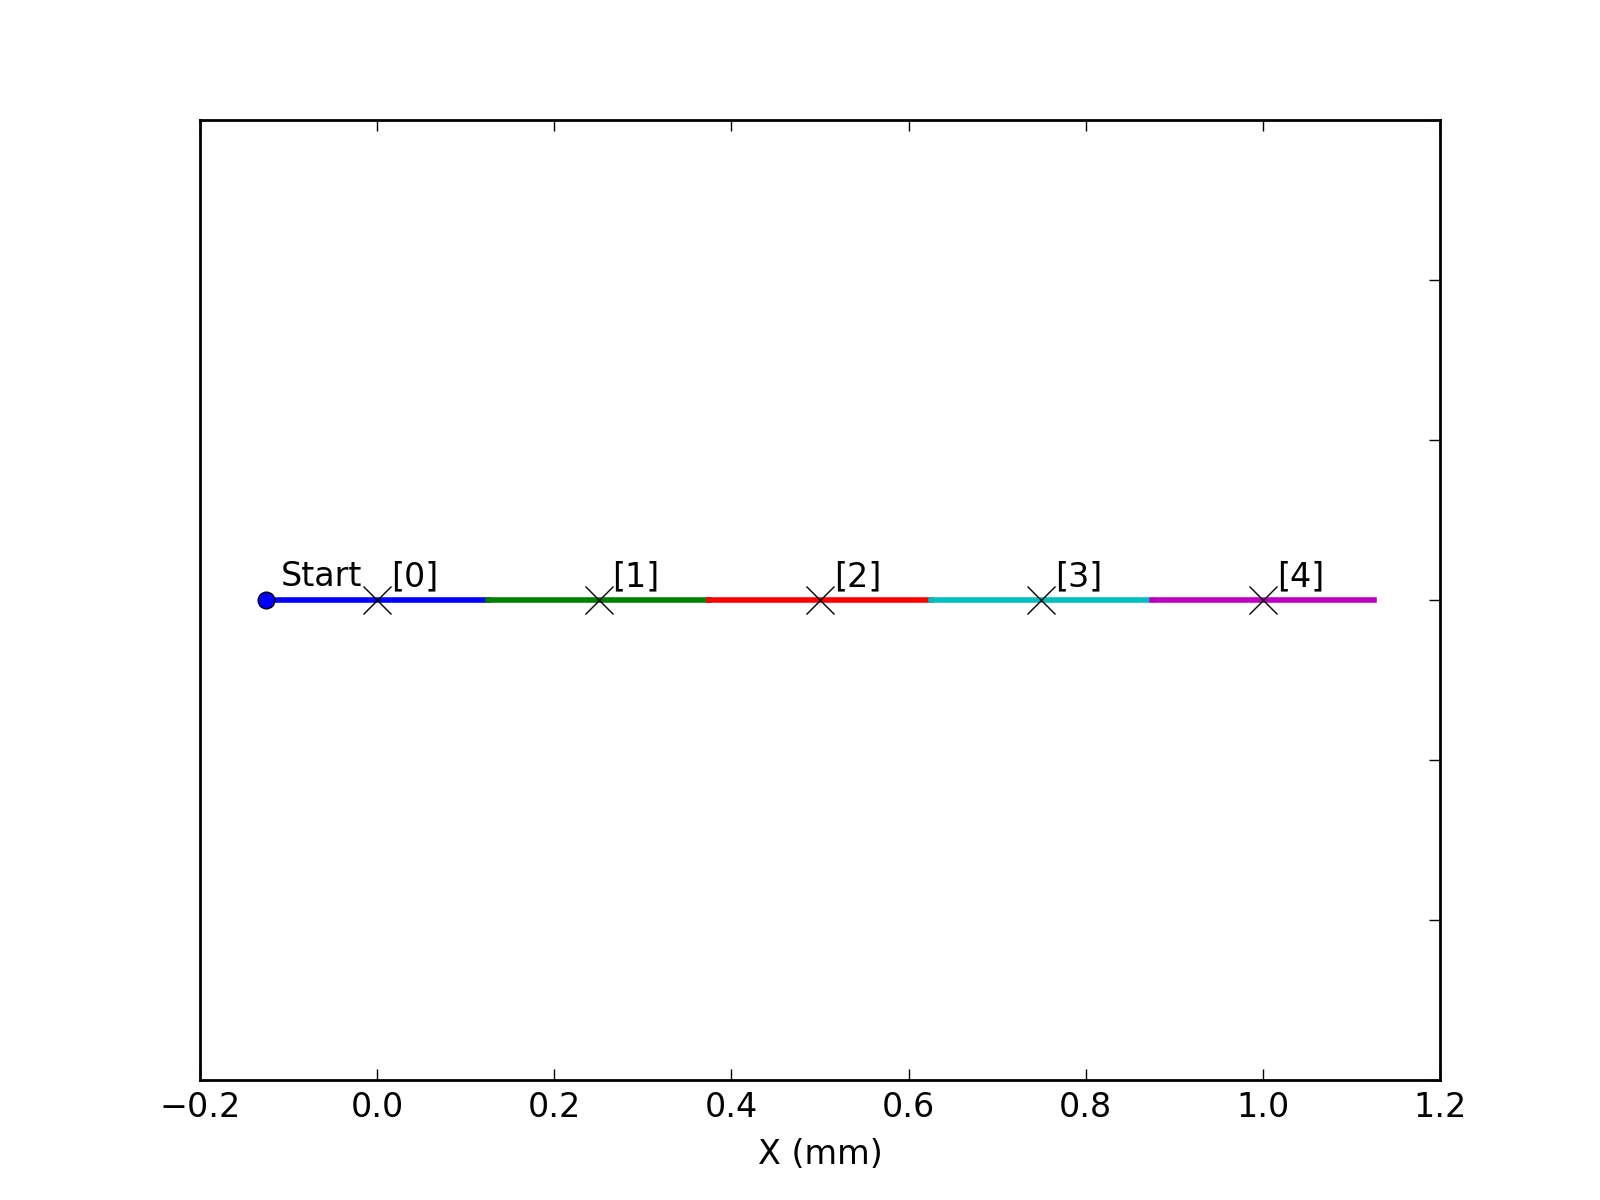 worksheet Number Line Generator number line creator time conversion worksheet simple algebra generator scanpointgenerator 210 documentation linegenerator 1 linegeneratorhtml creato